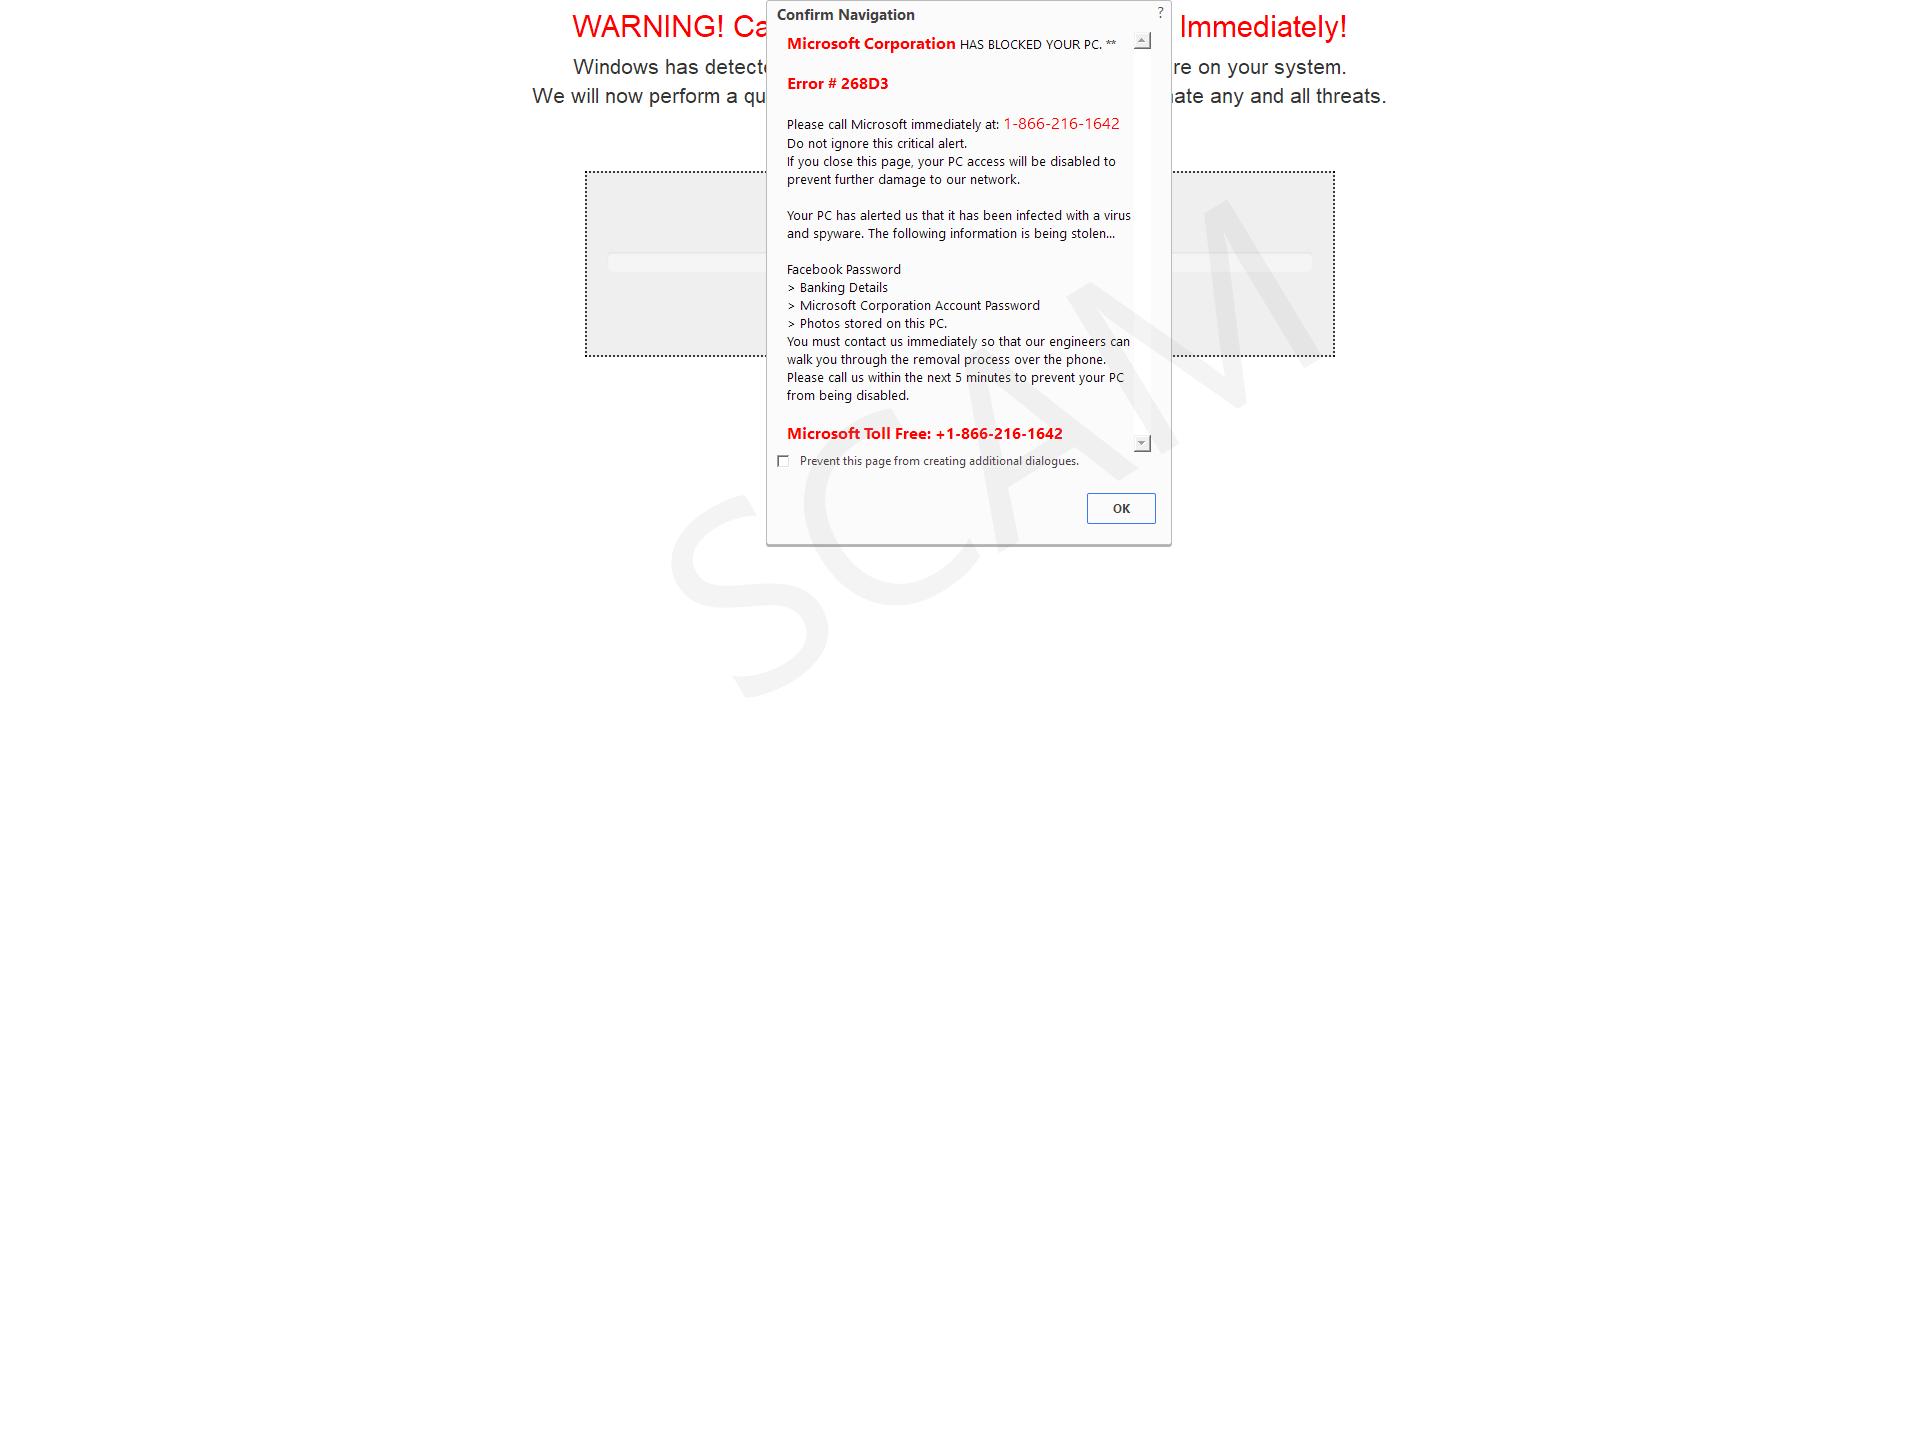 Microsoft Corporate HAS BLOCKED YOUR PC.**